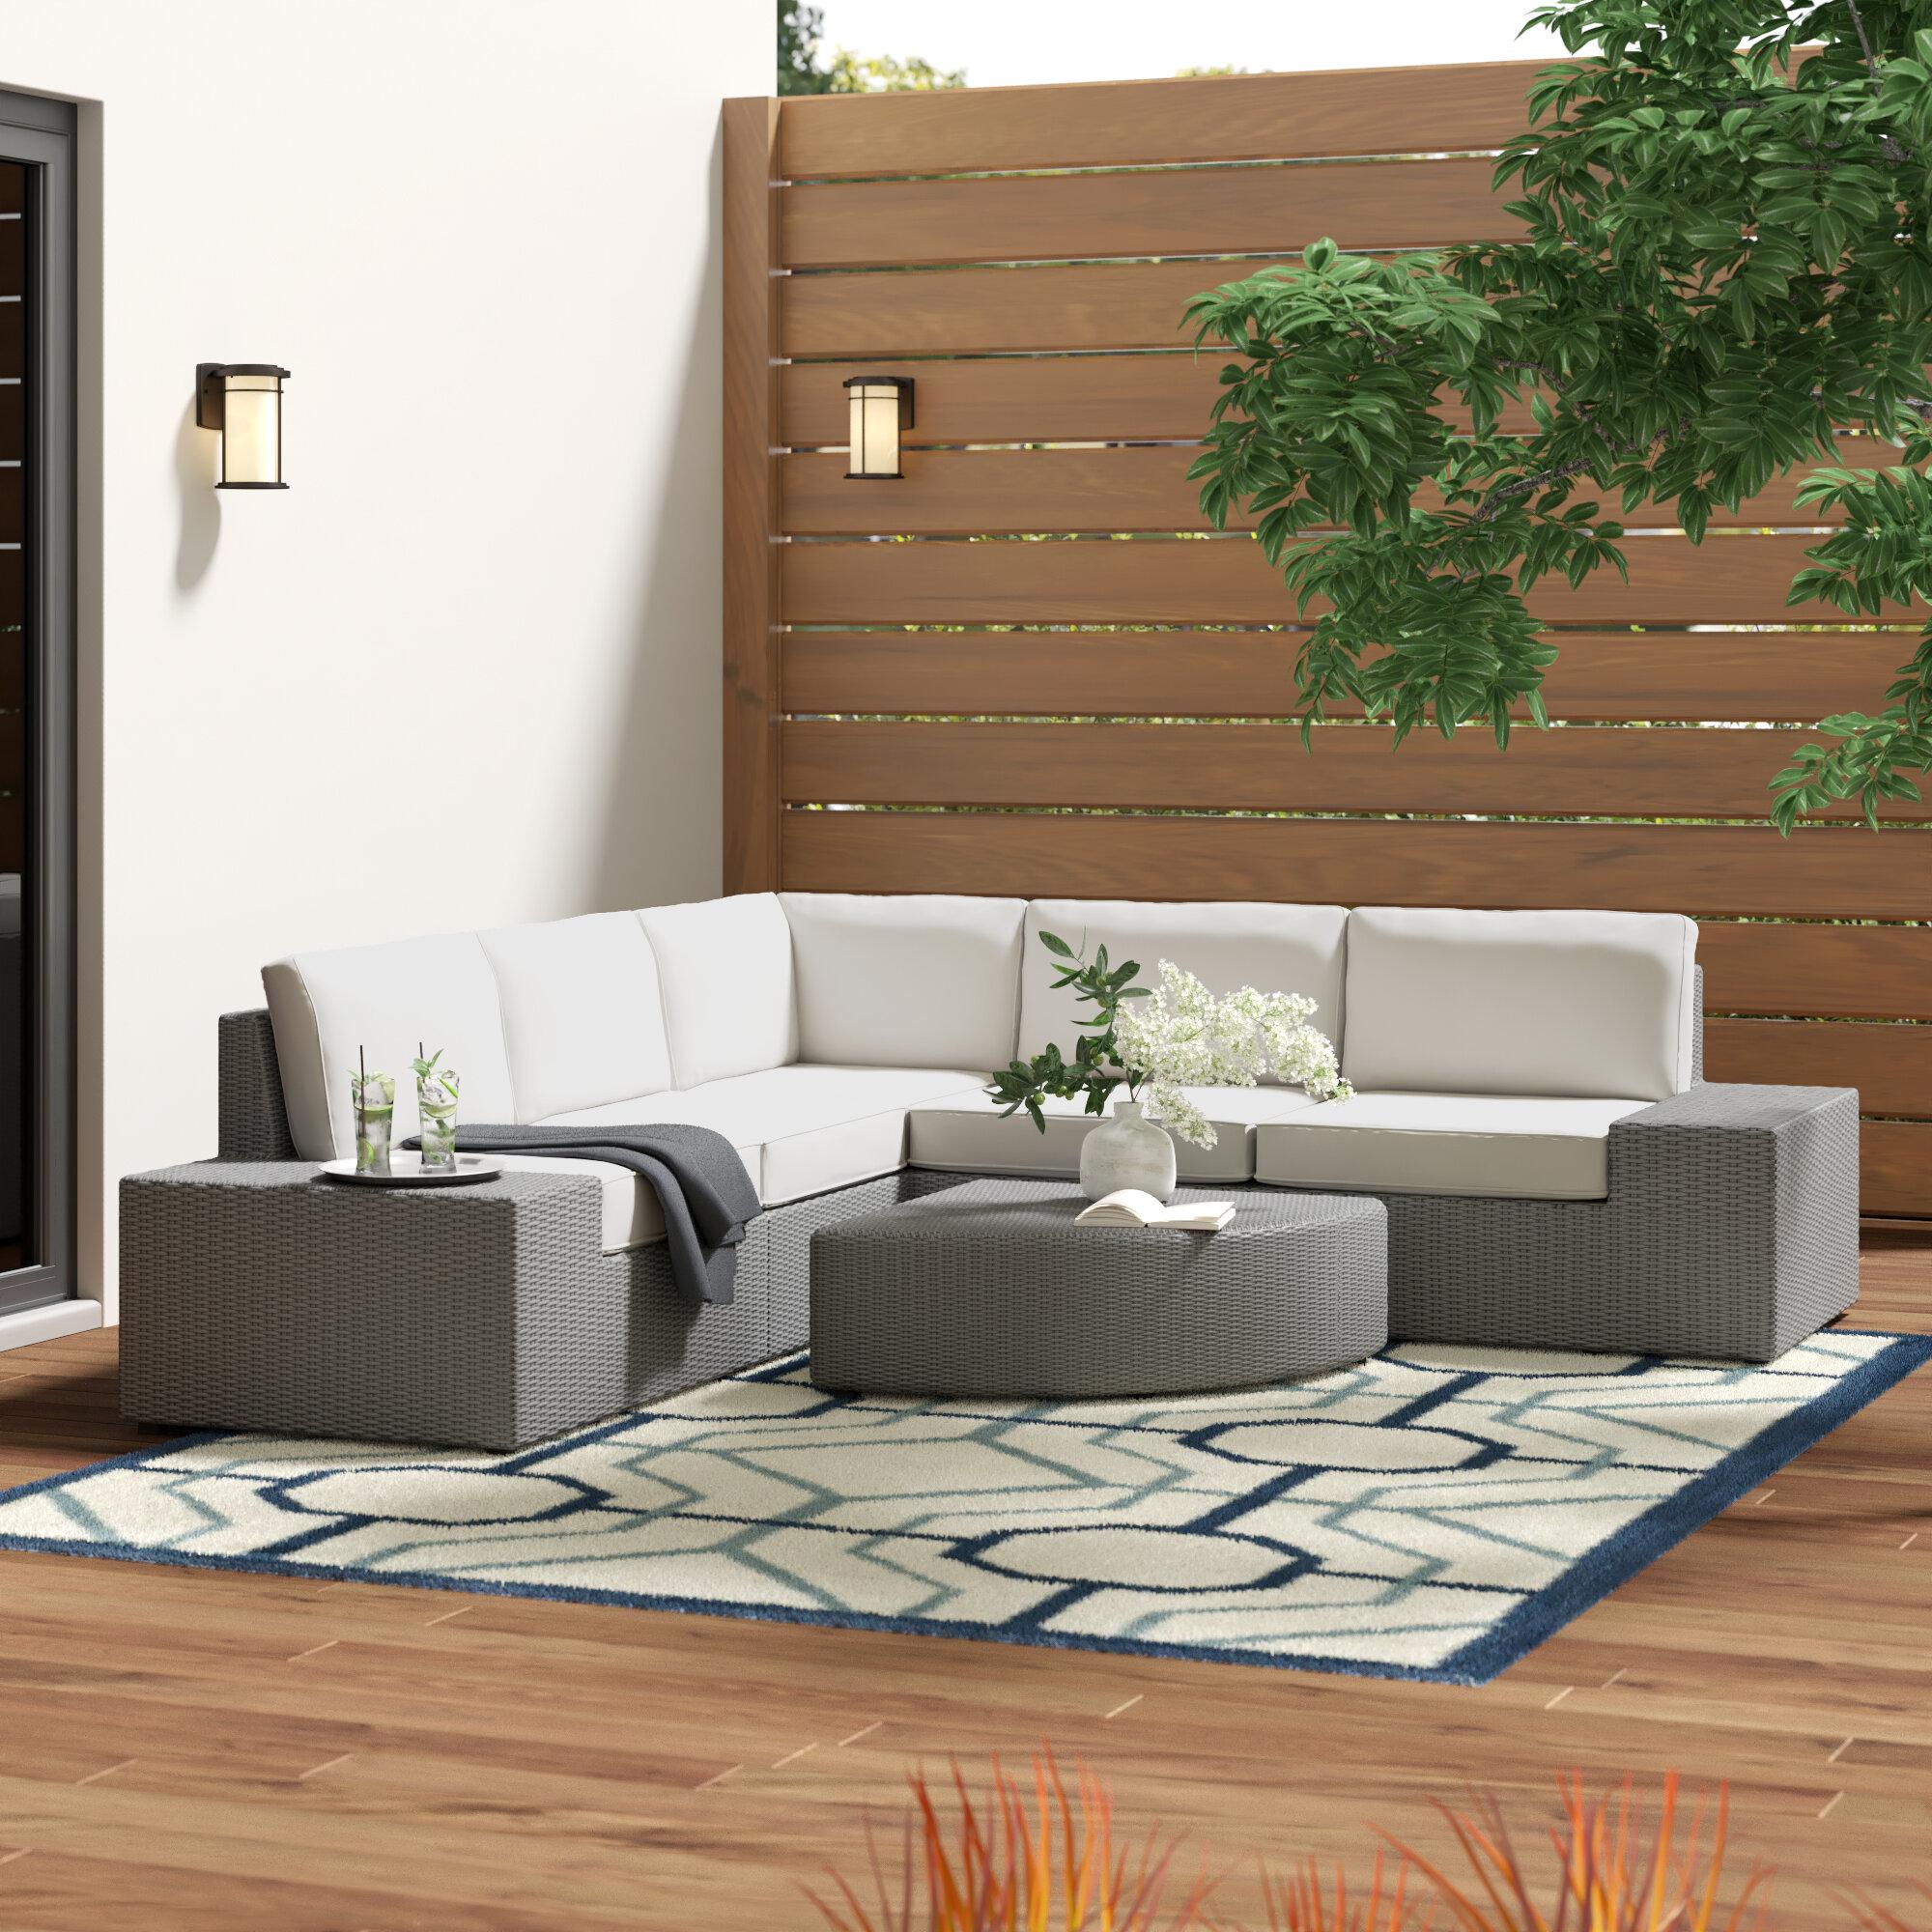 Latitude Run Guston 6 Piece Rattan Sectional Seating Group With Cushions Reviews Wayfair